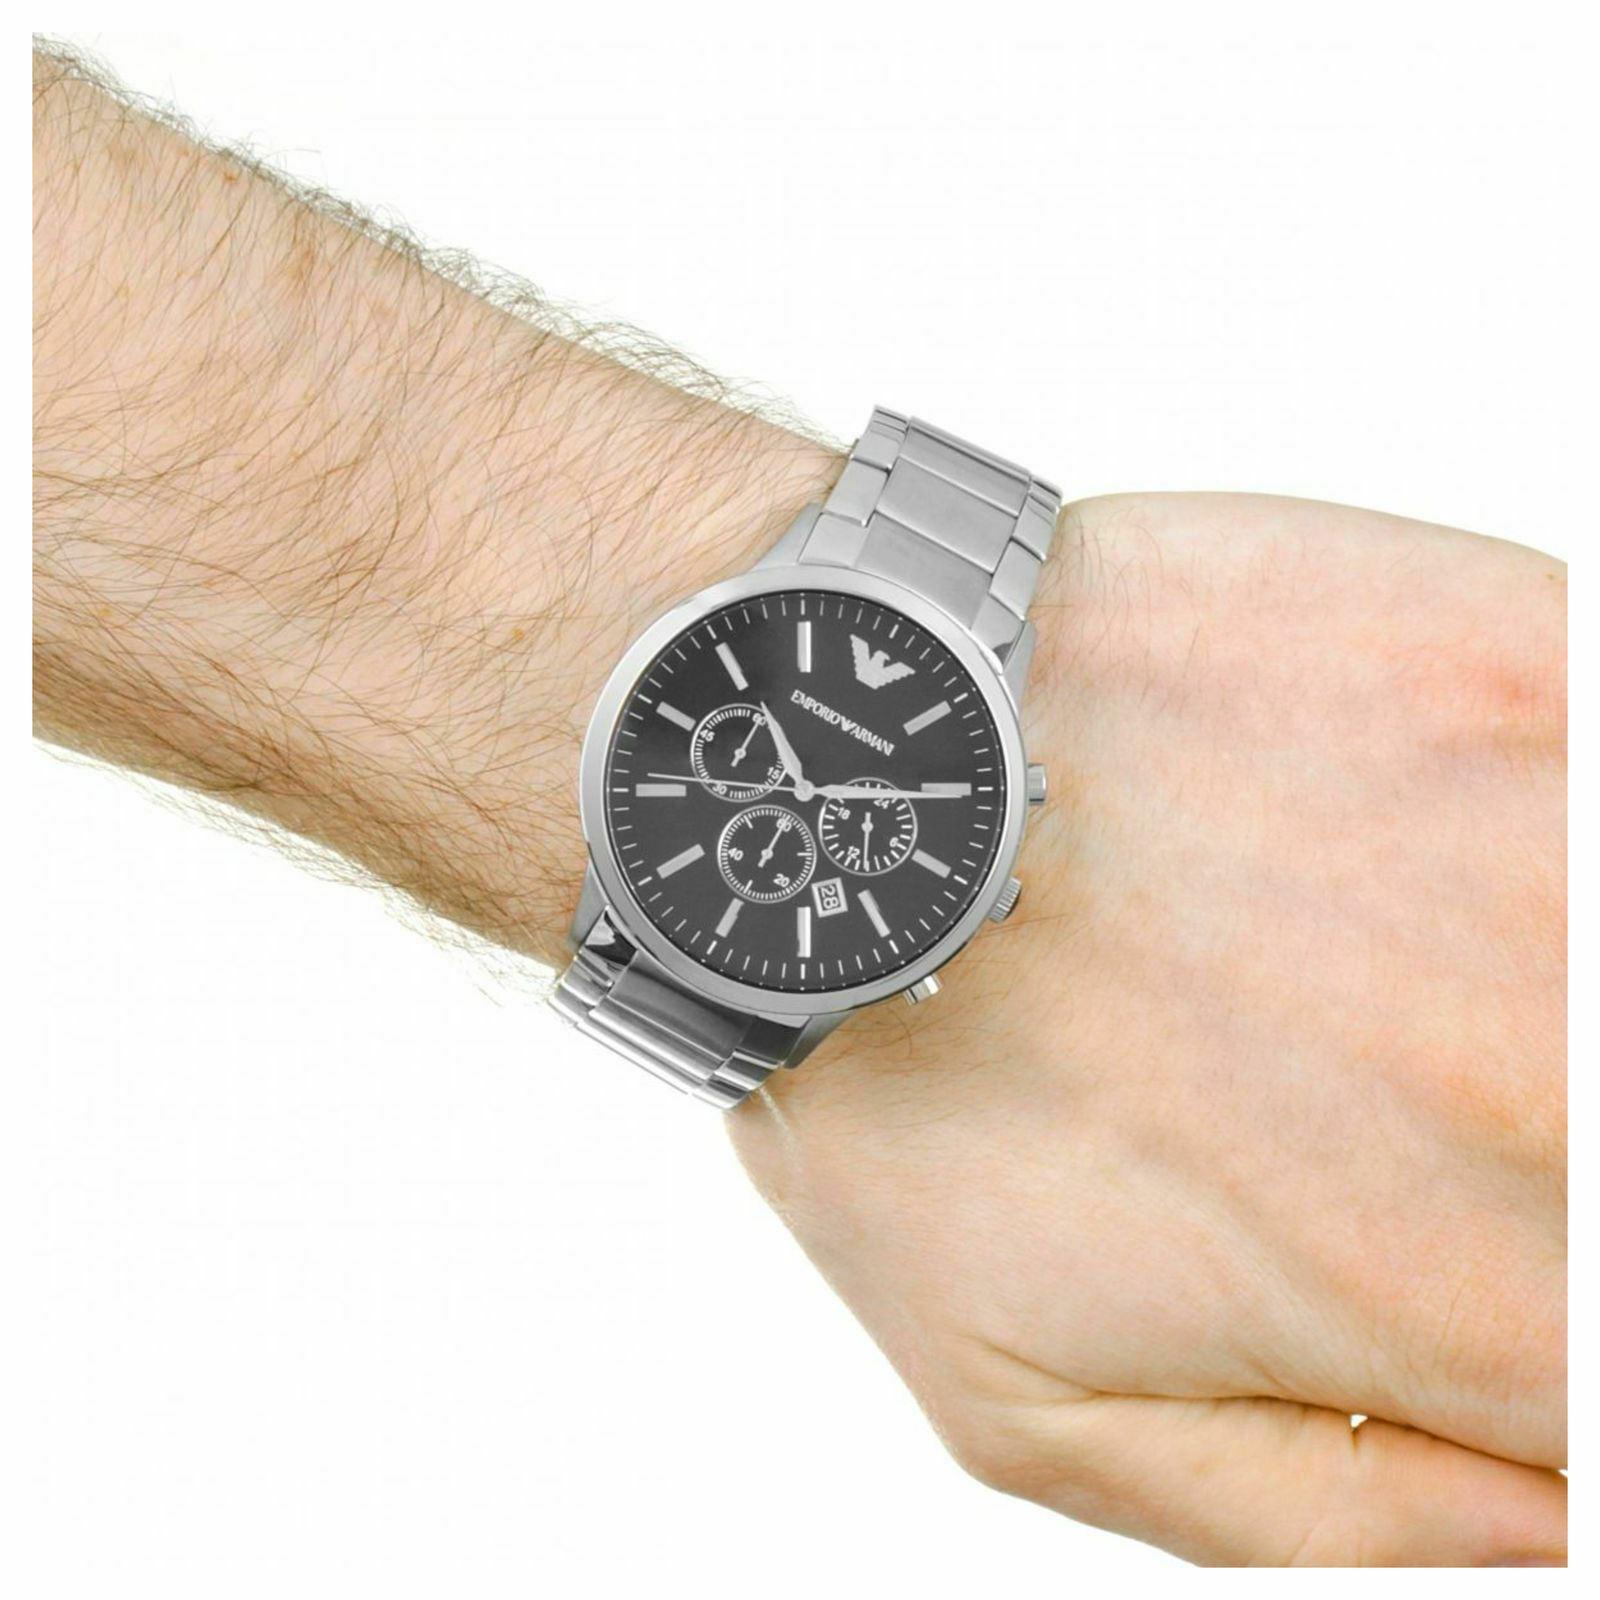 Emporio Armani Sportivo Chronograph Black Dial Steel Men's Watch AR2460